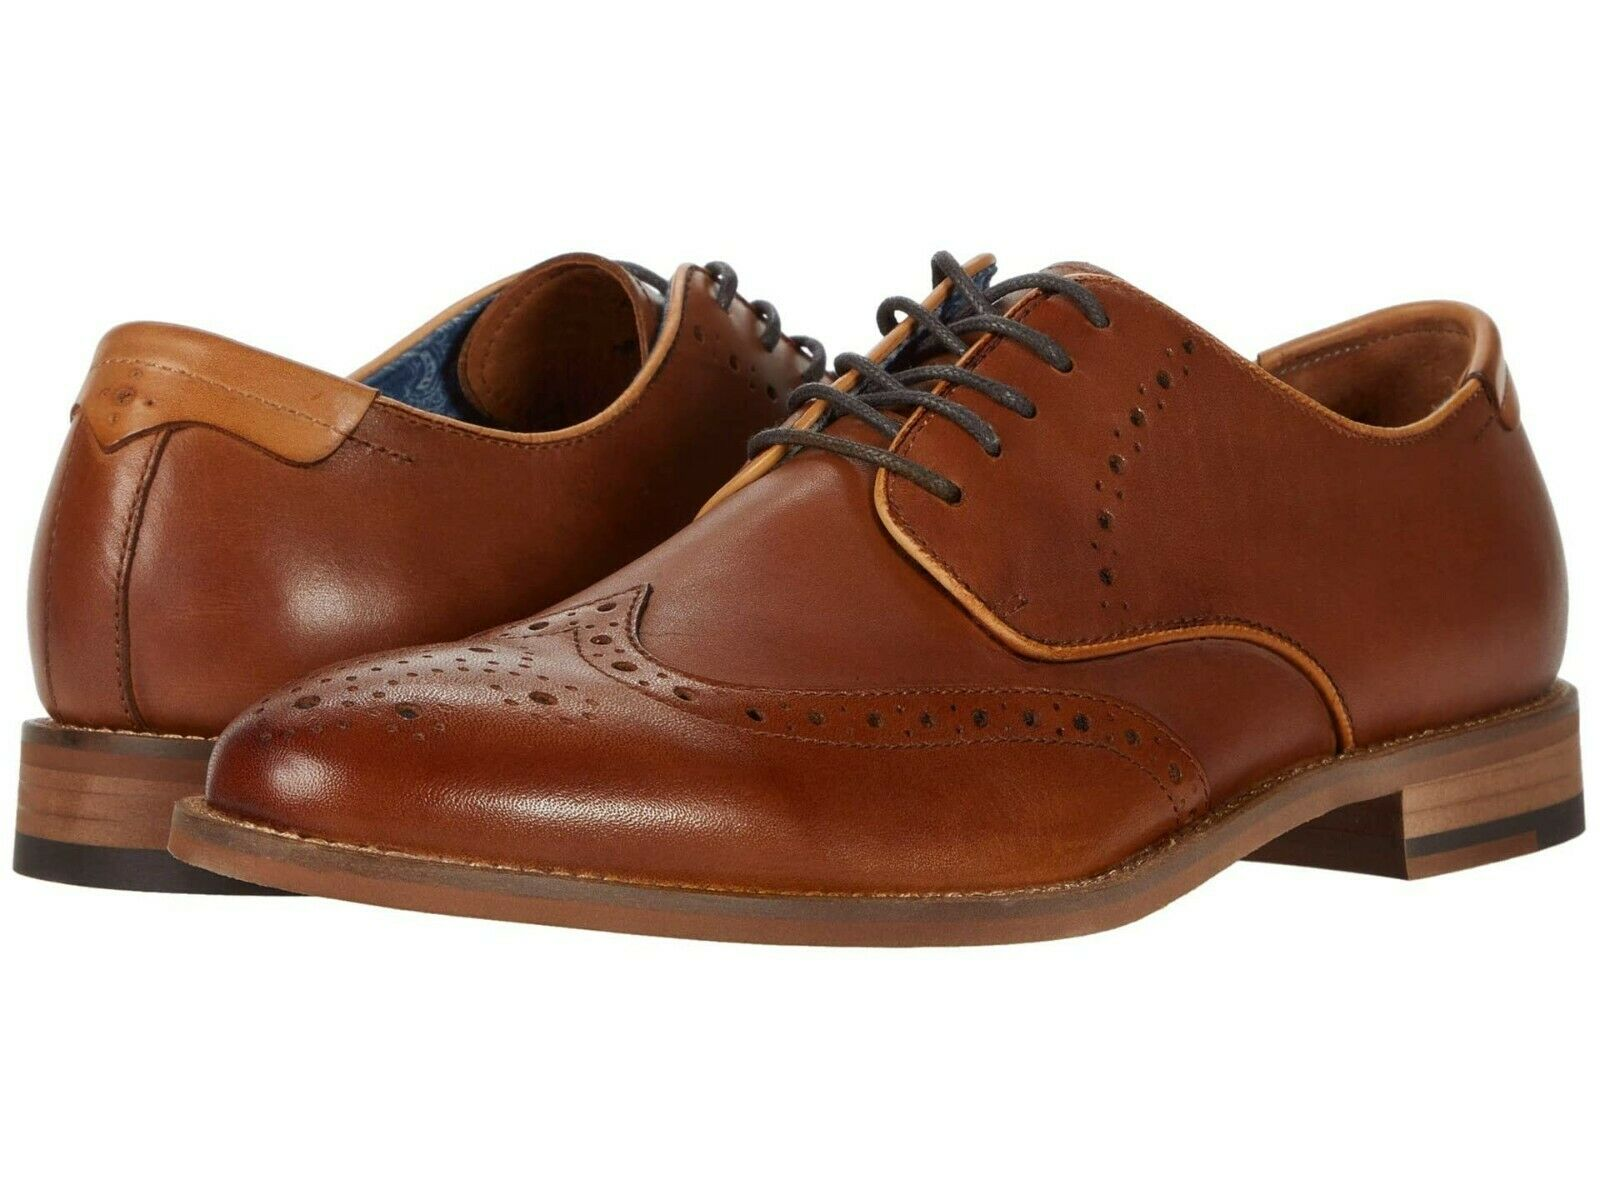 Men's Johnston & Murphy Milliken Leather Wingtip Shoes, 20-5816 Multi Sizes Tan